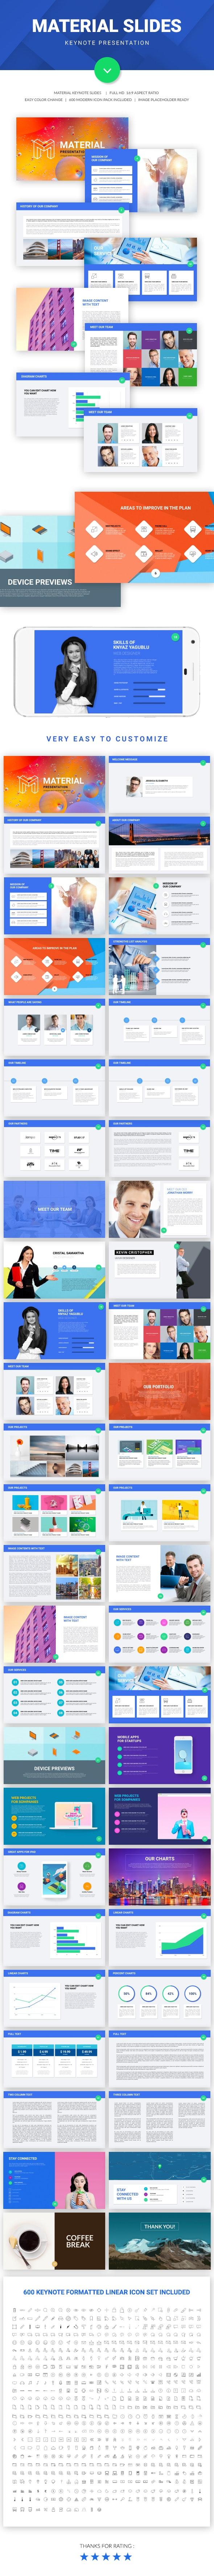 Material Slide Keynote Presentation Template - Keynote Templates Presentation Templates